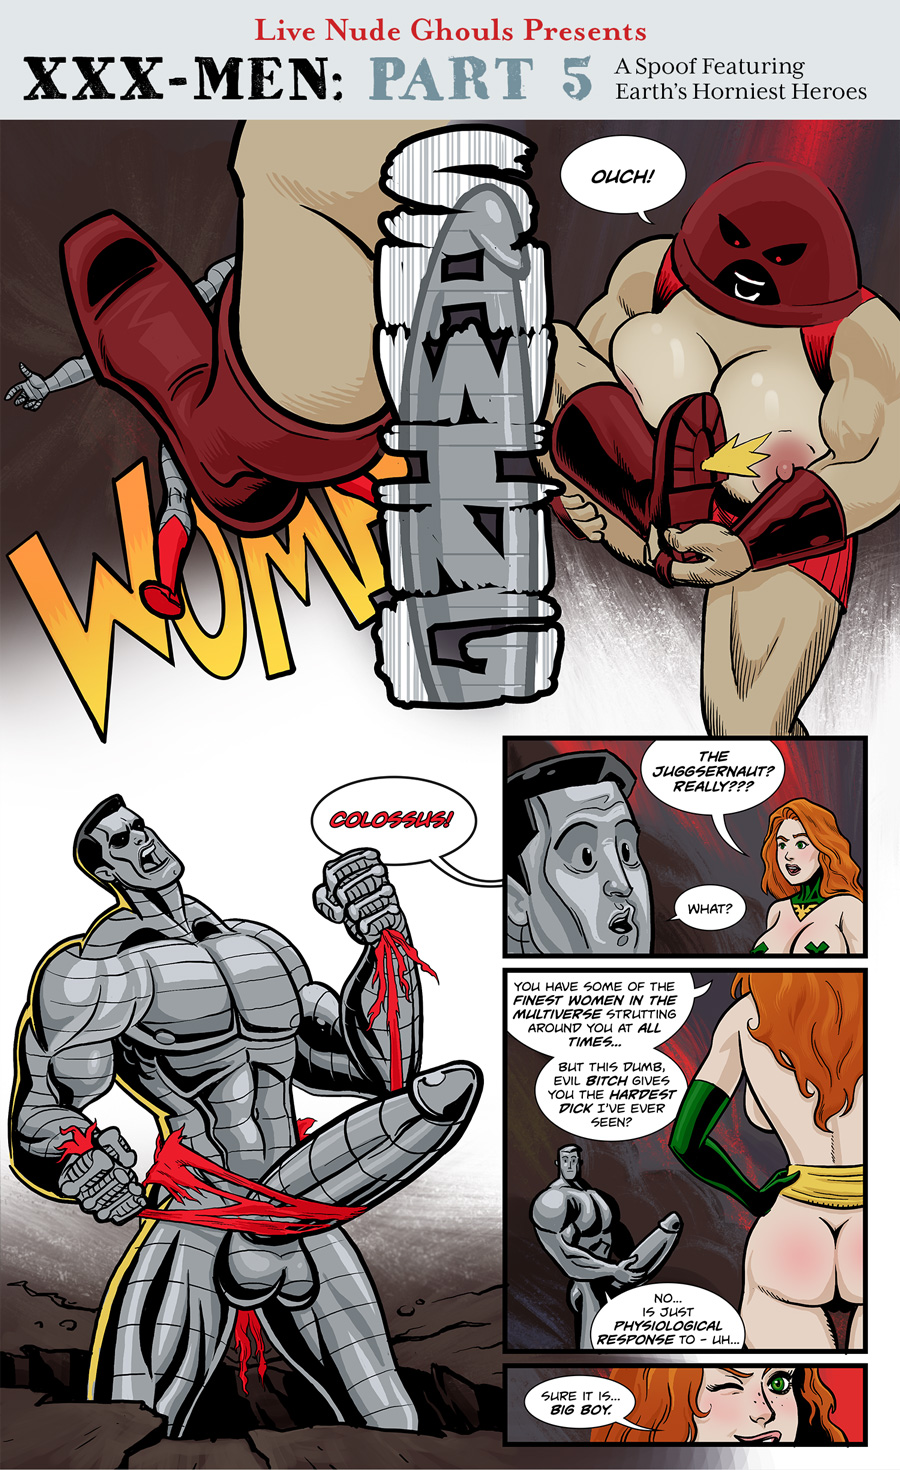 XXX-Men: Part 5 – A Live Nude Ghouls Spoof Comic